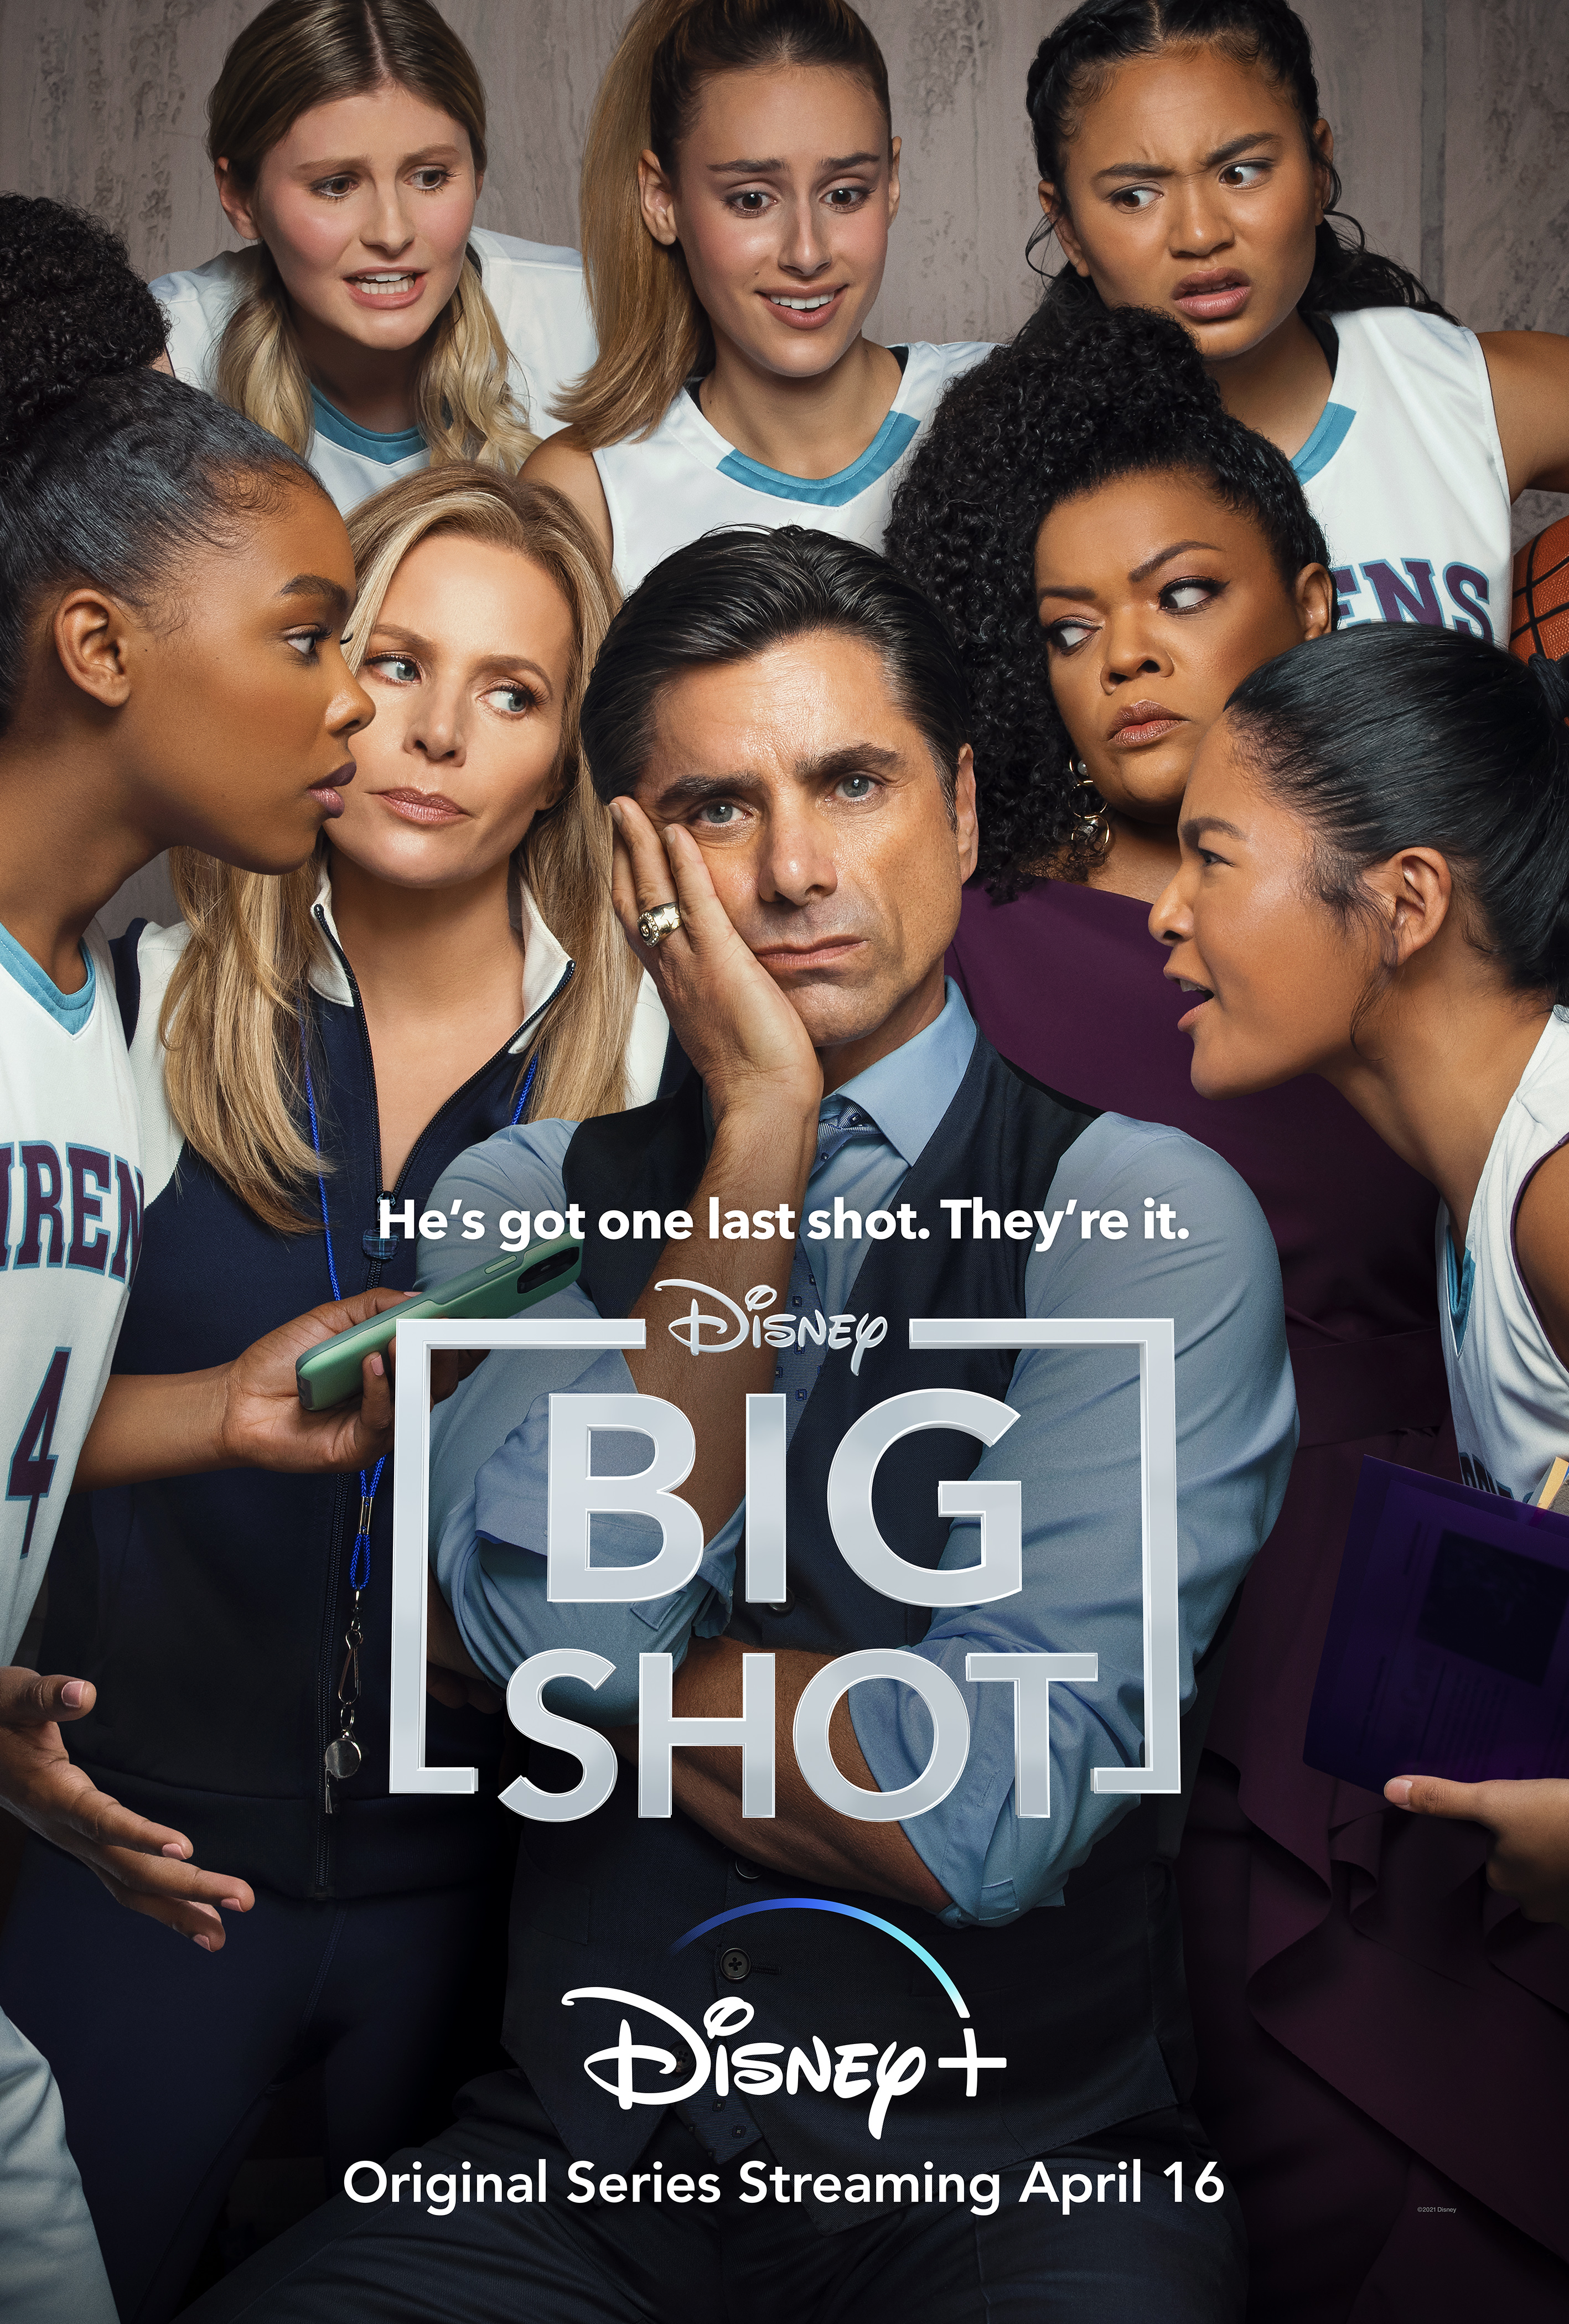 John Stamos' Big Shot, Turner & Hooch Reboot, Mysterious Benedict Society  Get Disney+ Premiere Dates